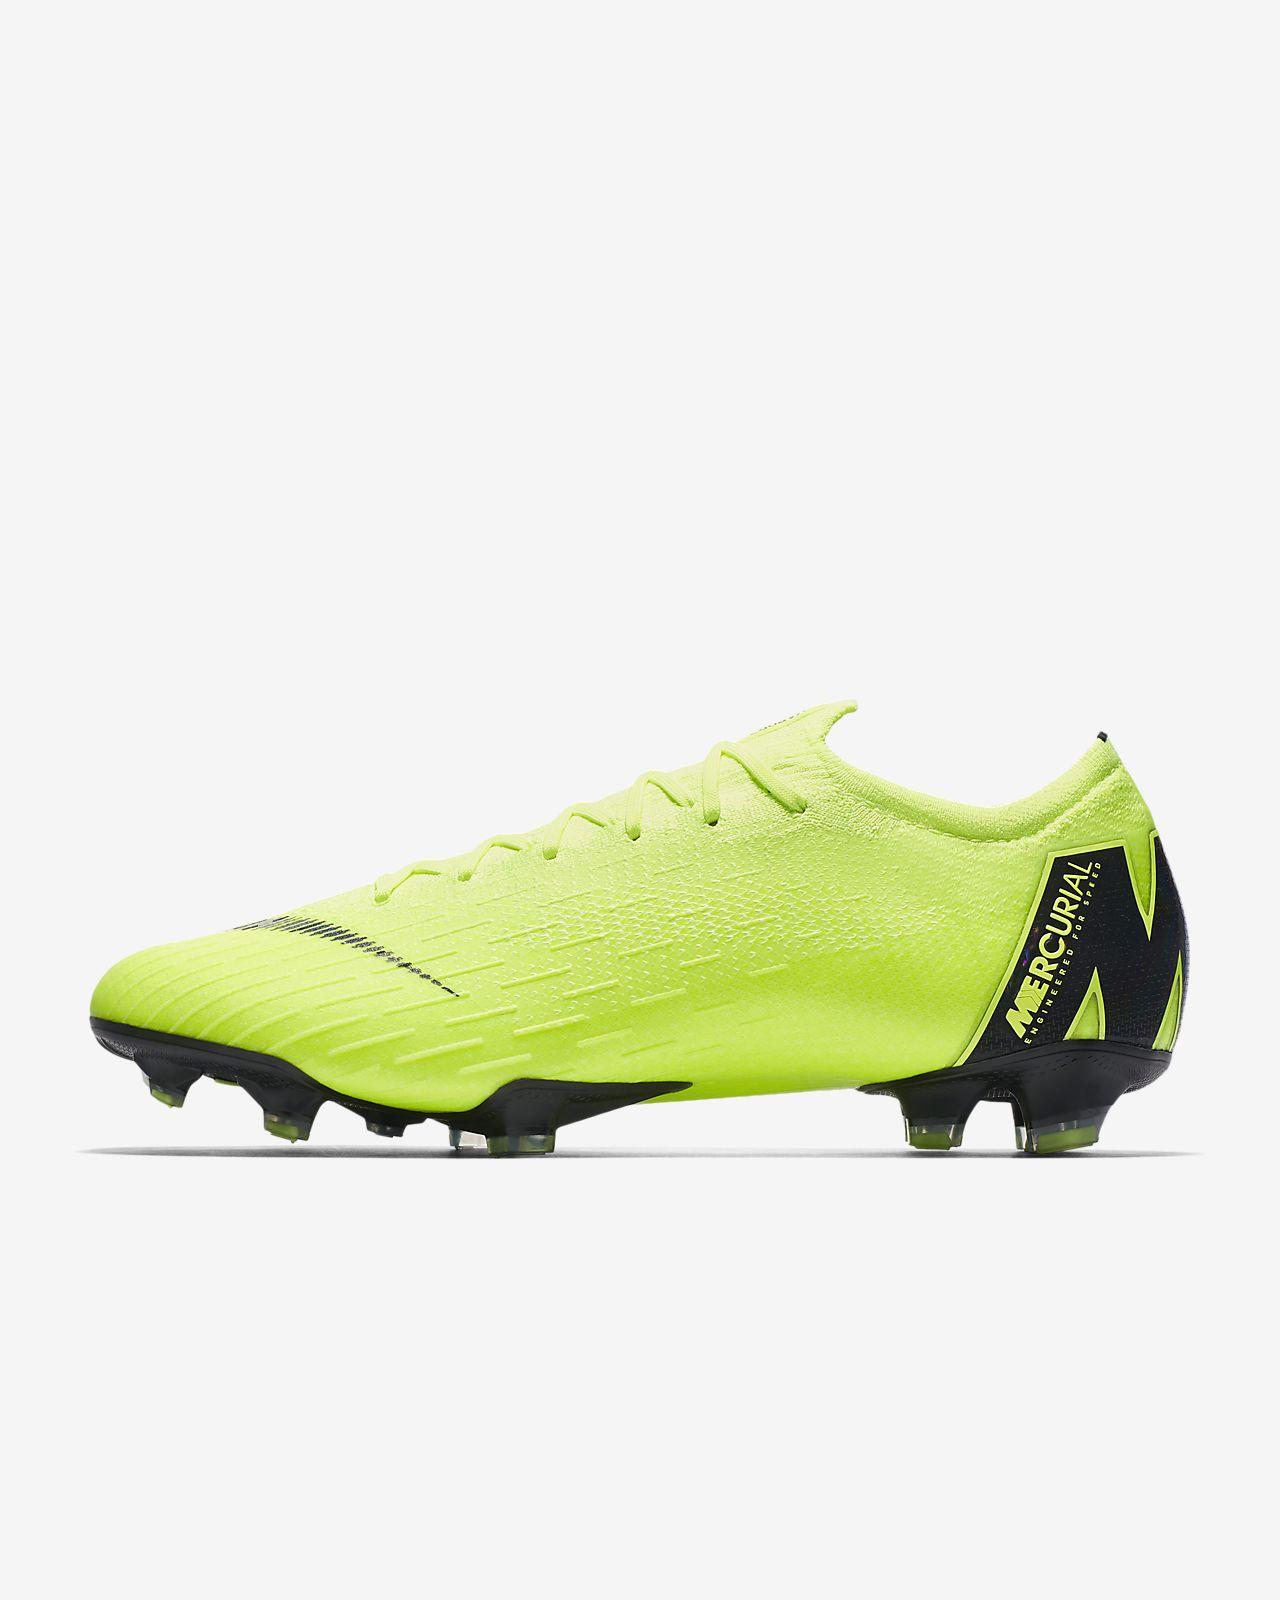 timeless design 48ce5 b435d ... Nike Vapor 12 Elite FG Fußballschuh für normalen Rasen